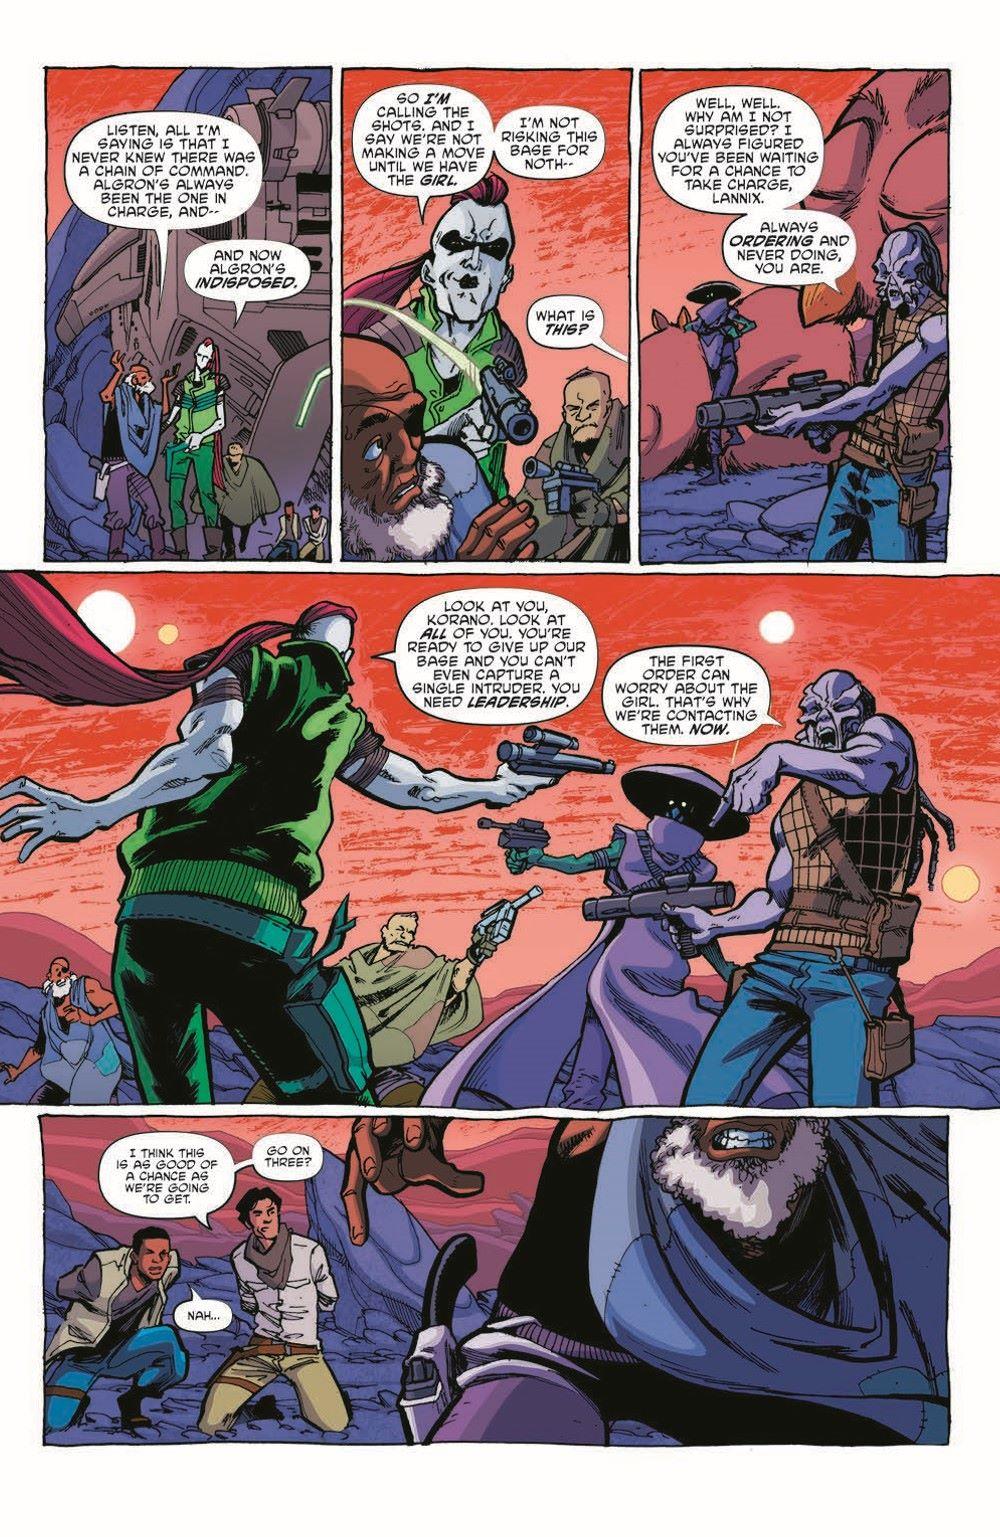 StarWarsAdv02-pr-7 ComicList Previews: STAR WARS ADVENTURES VOLUME 2 #2